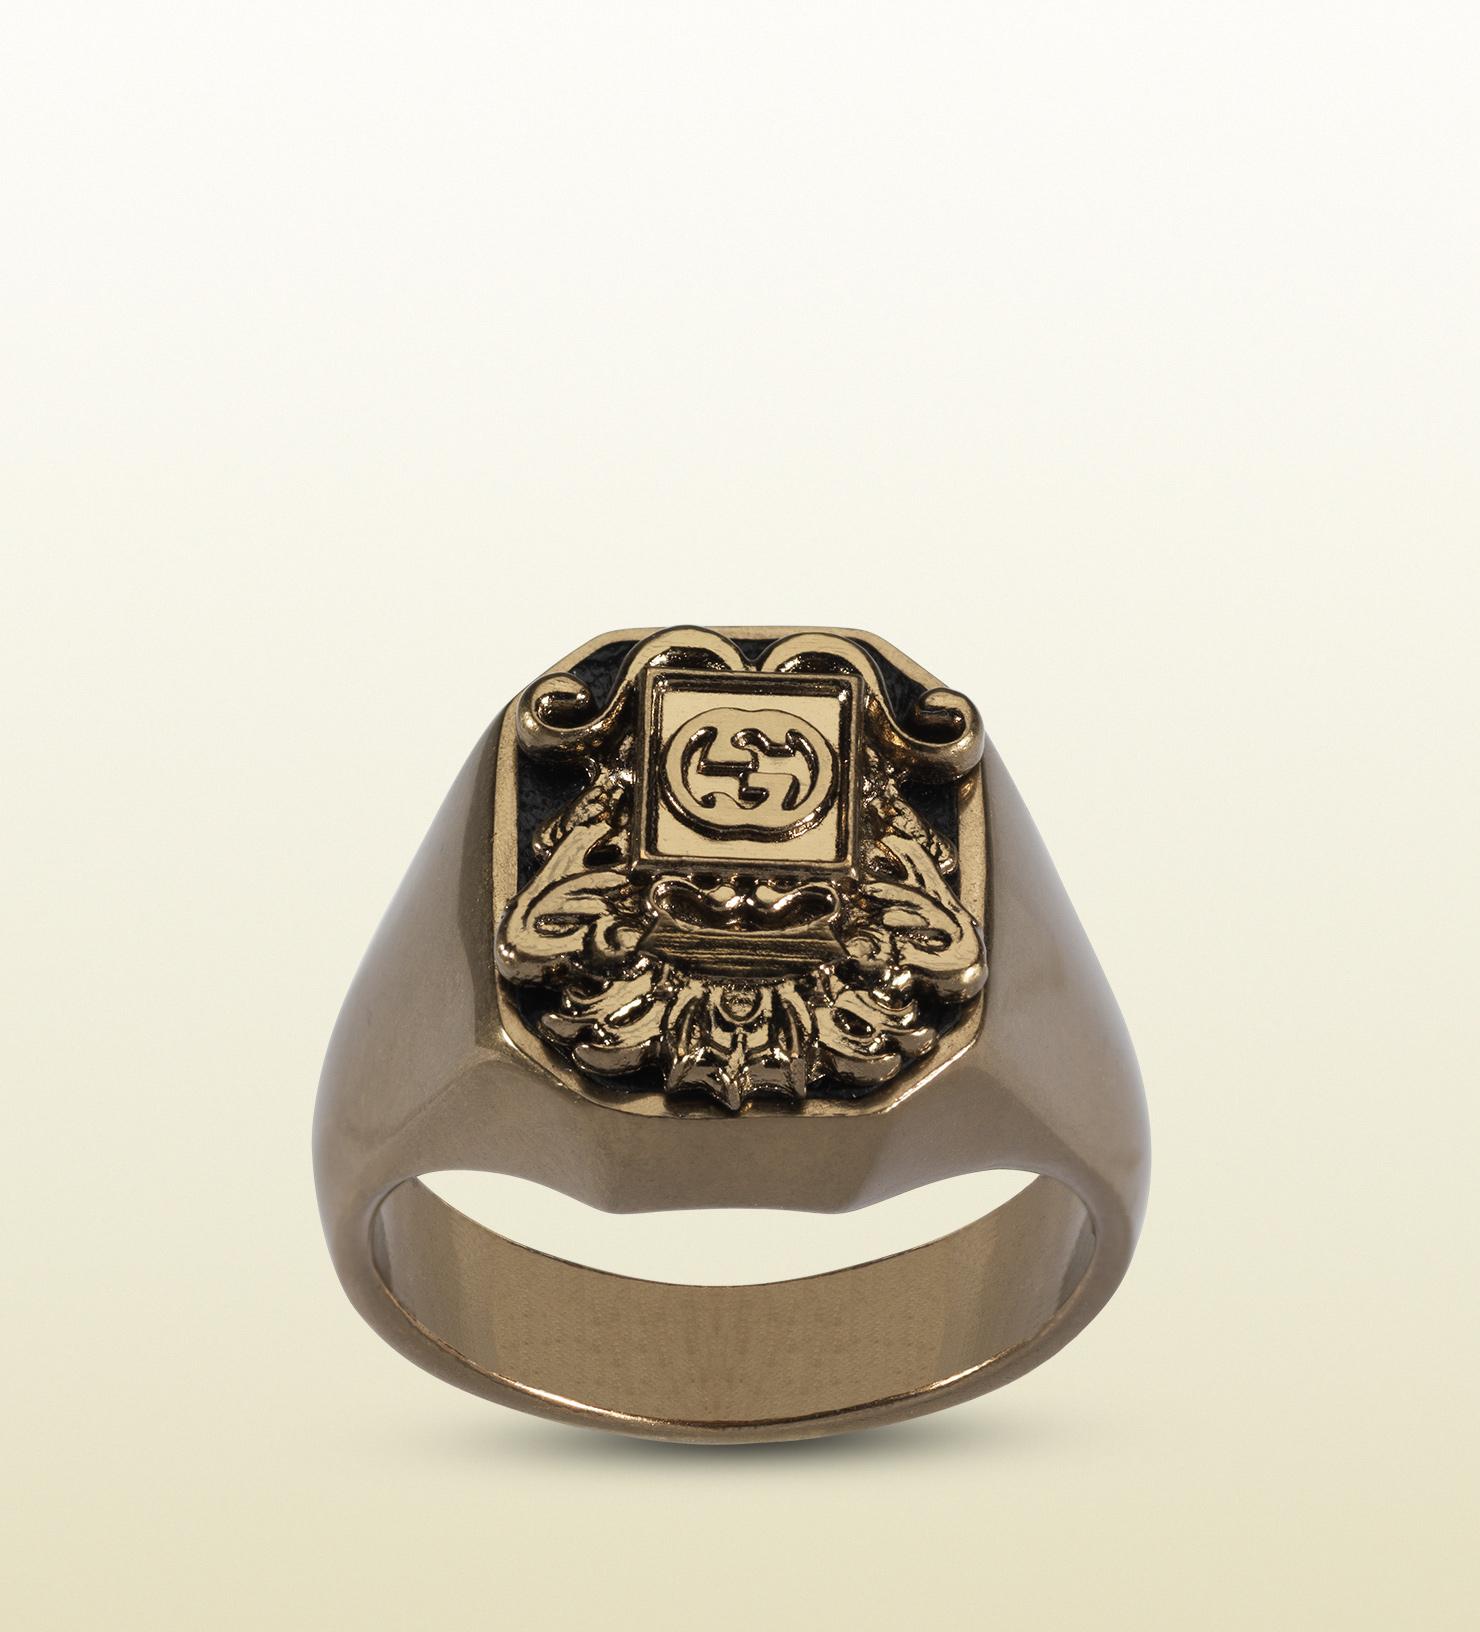 Lyst Gucci Vintage Crest Ring in Metallic for Men